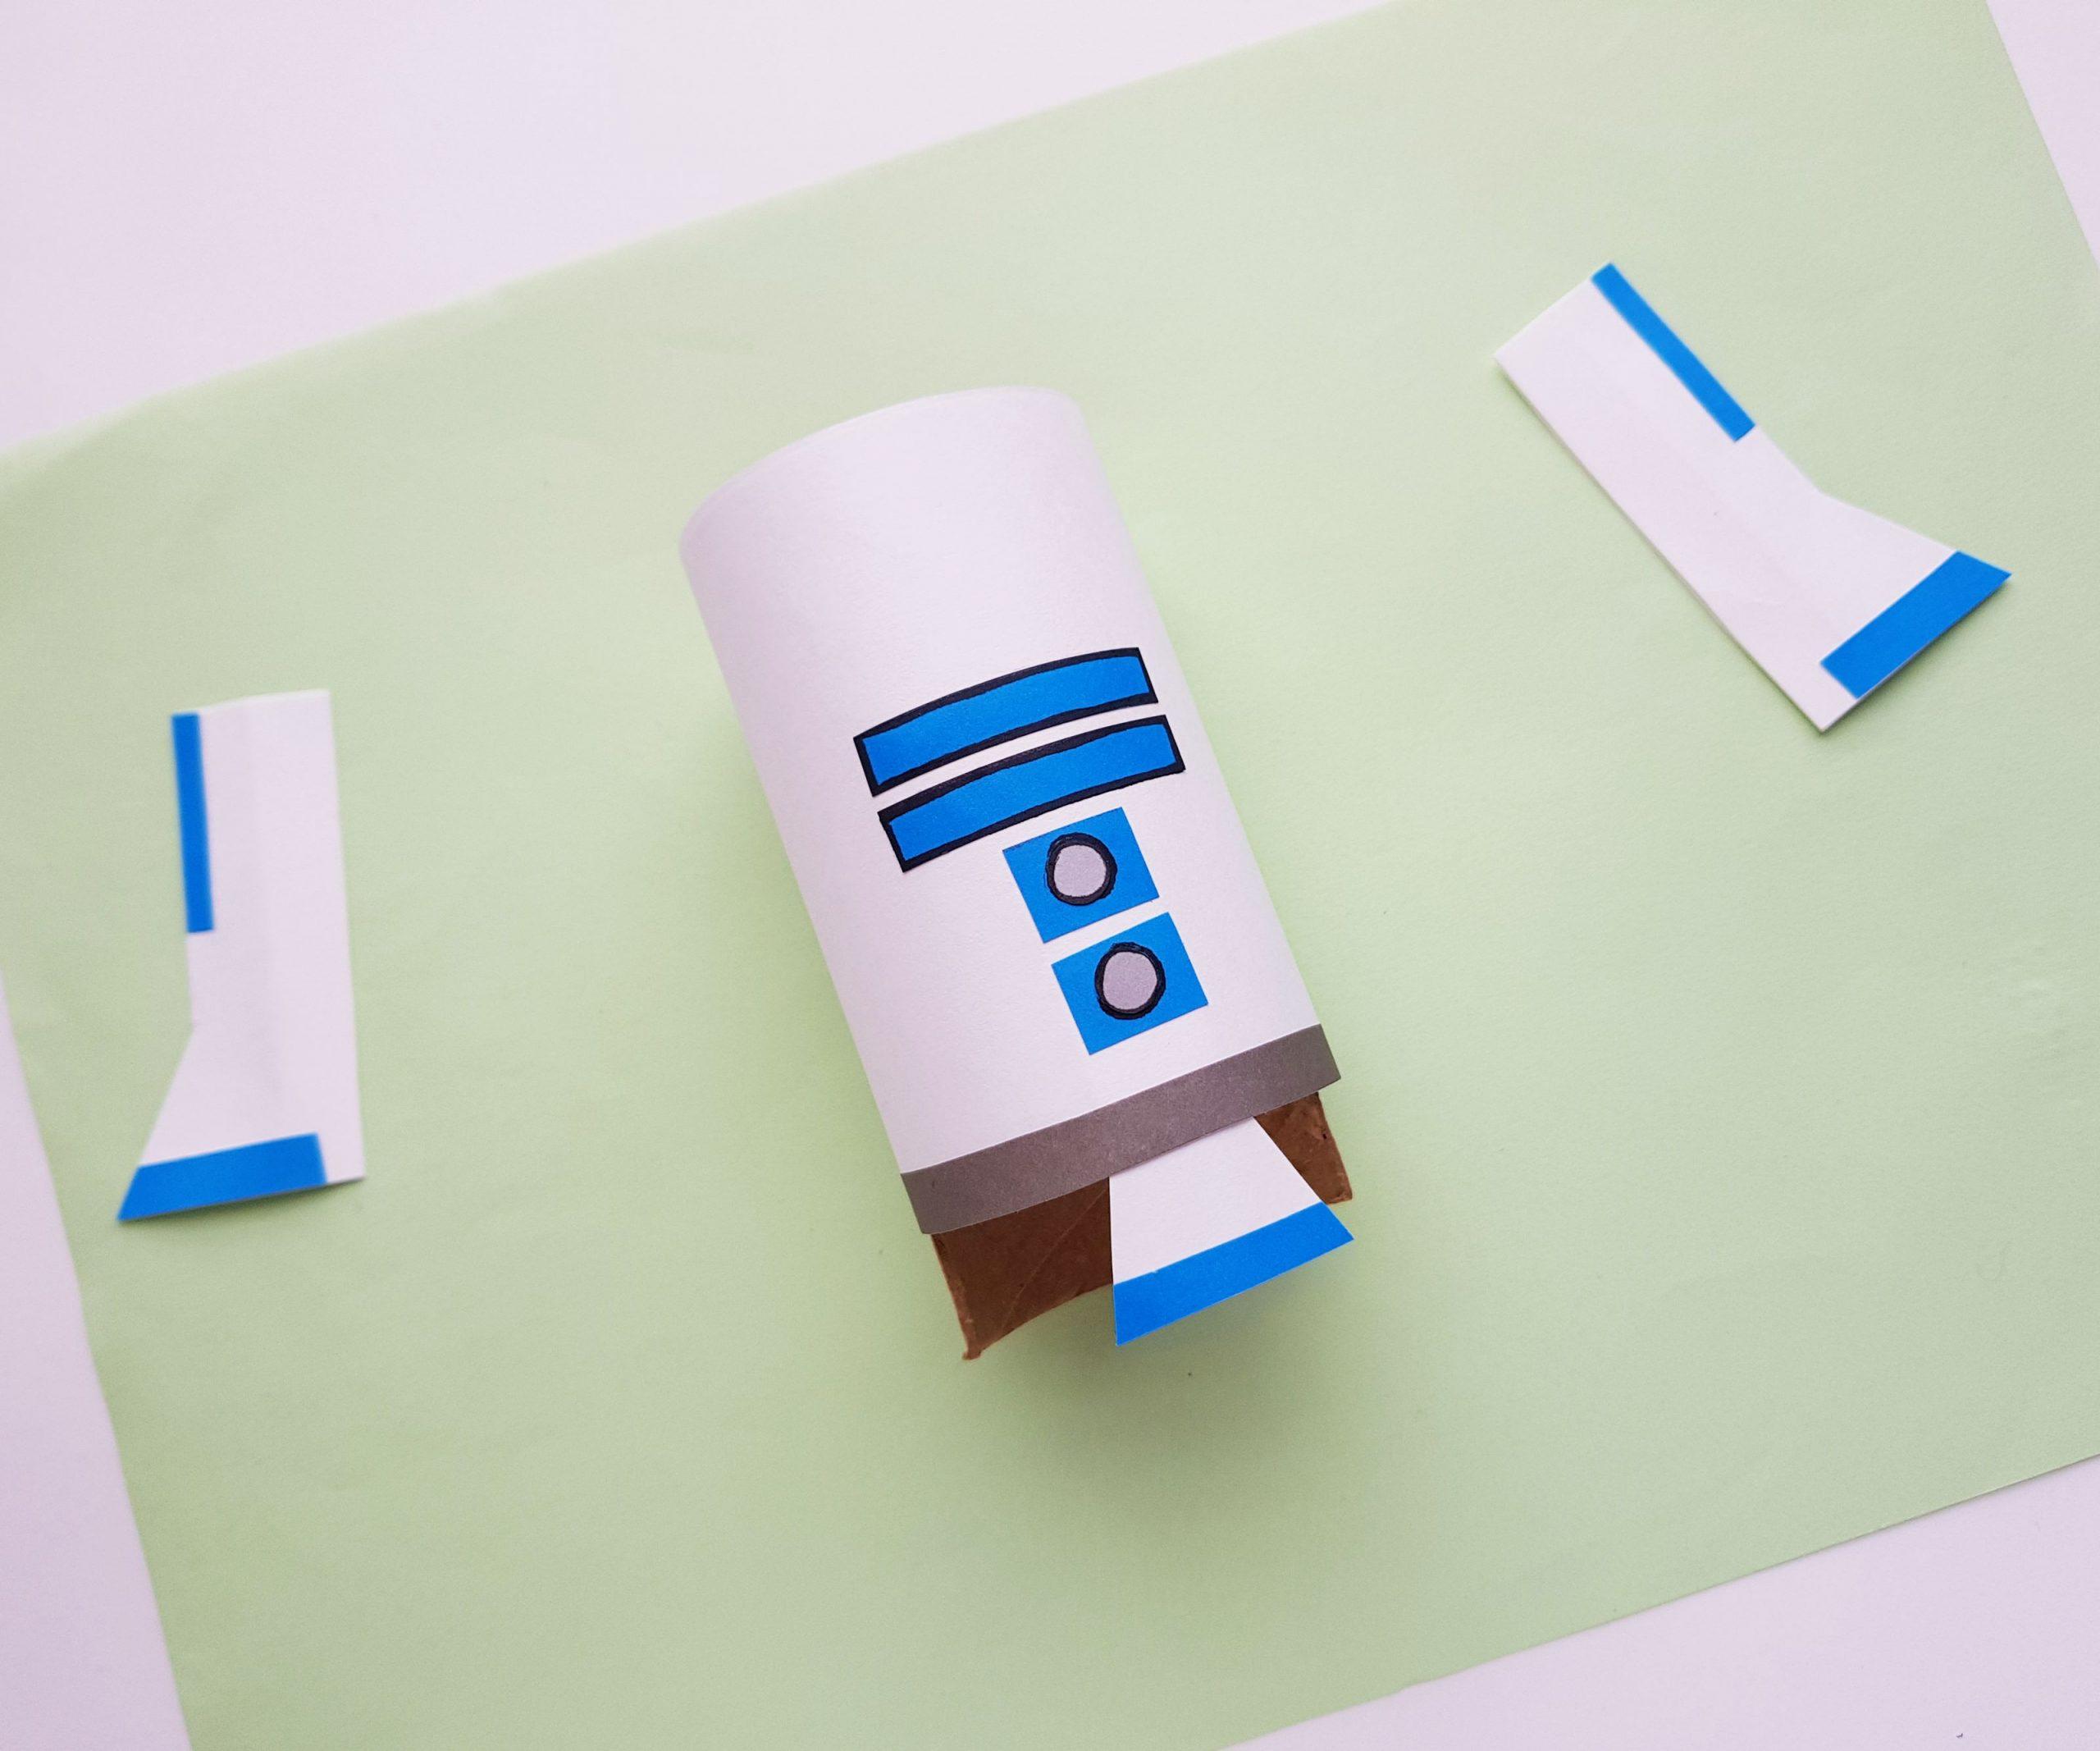 Star Wars Toilet Paper Roll R2D2 Craft